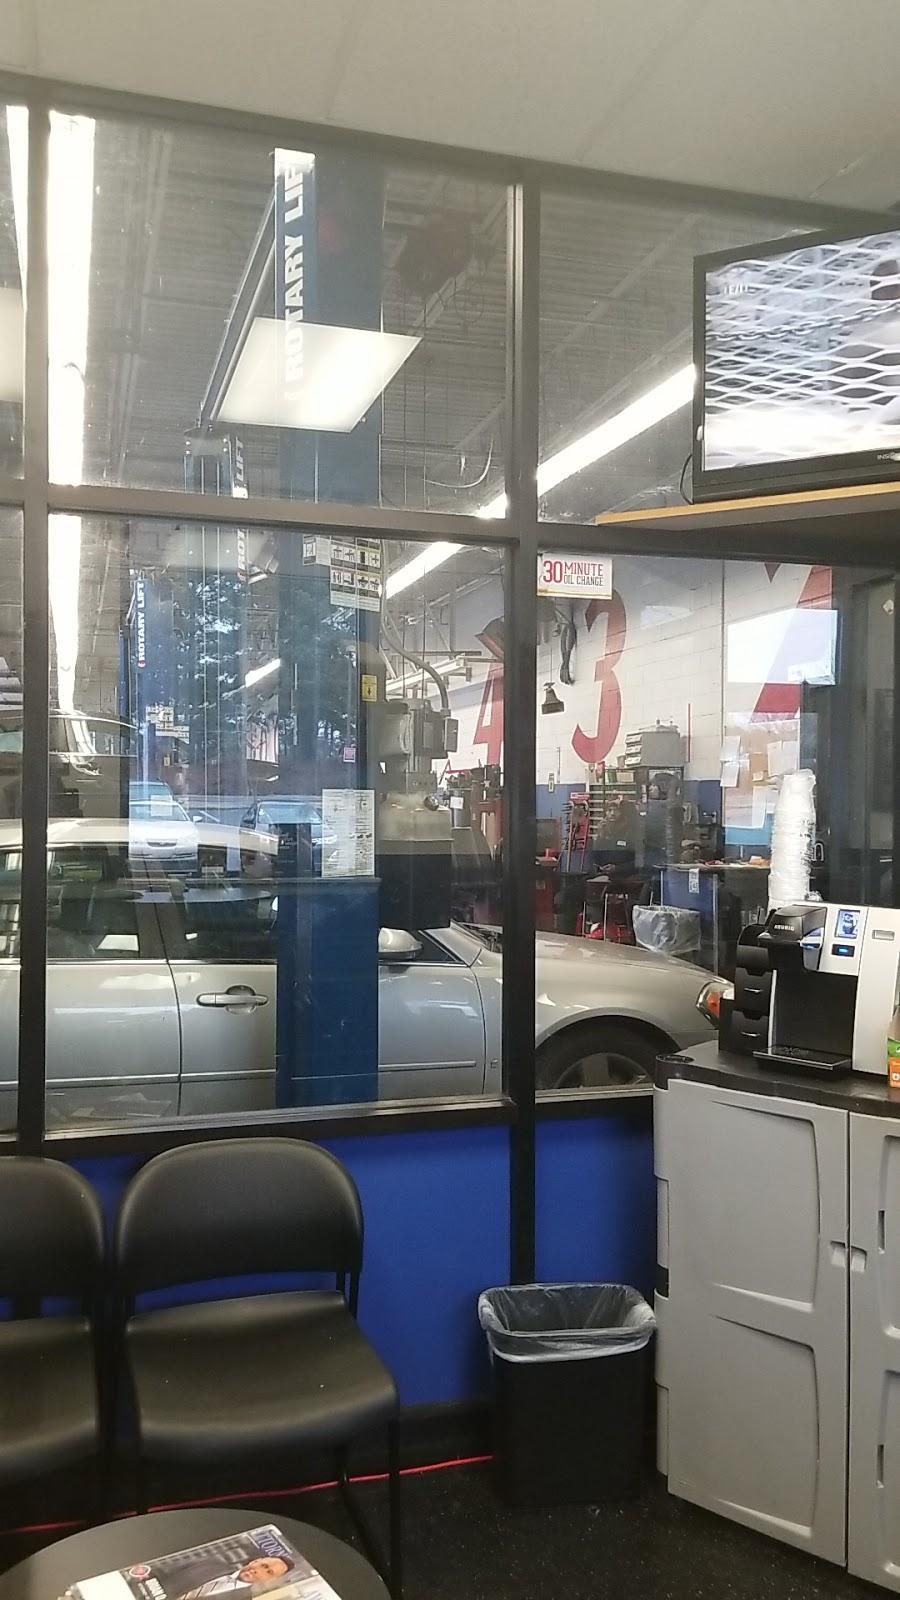 Pep Boys - car repair    Photo 3 of 10   Address: 5000 GA-138, Union City, GA 30291, USA   Phone: (770) 964-0071